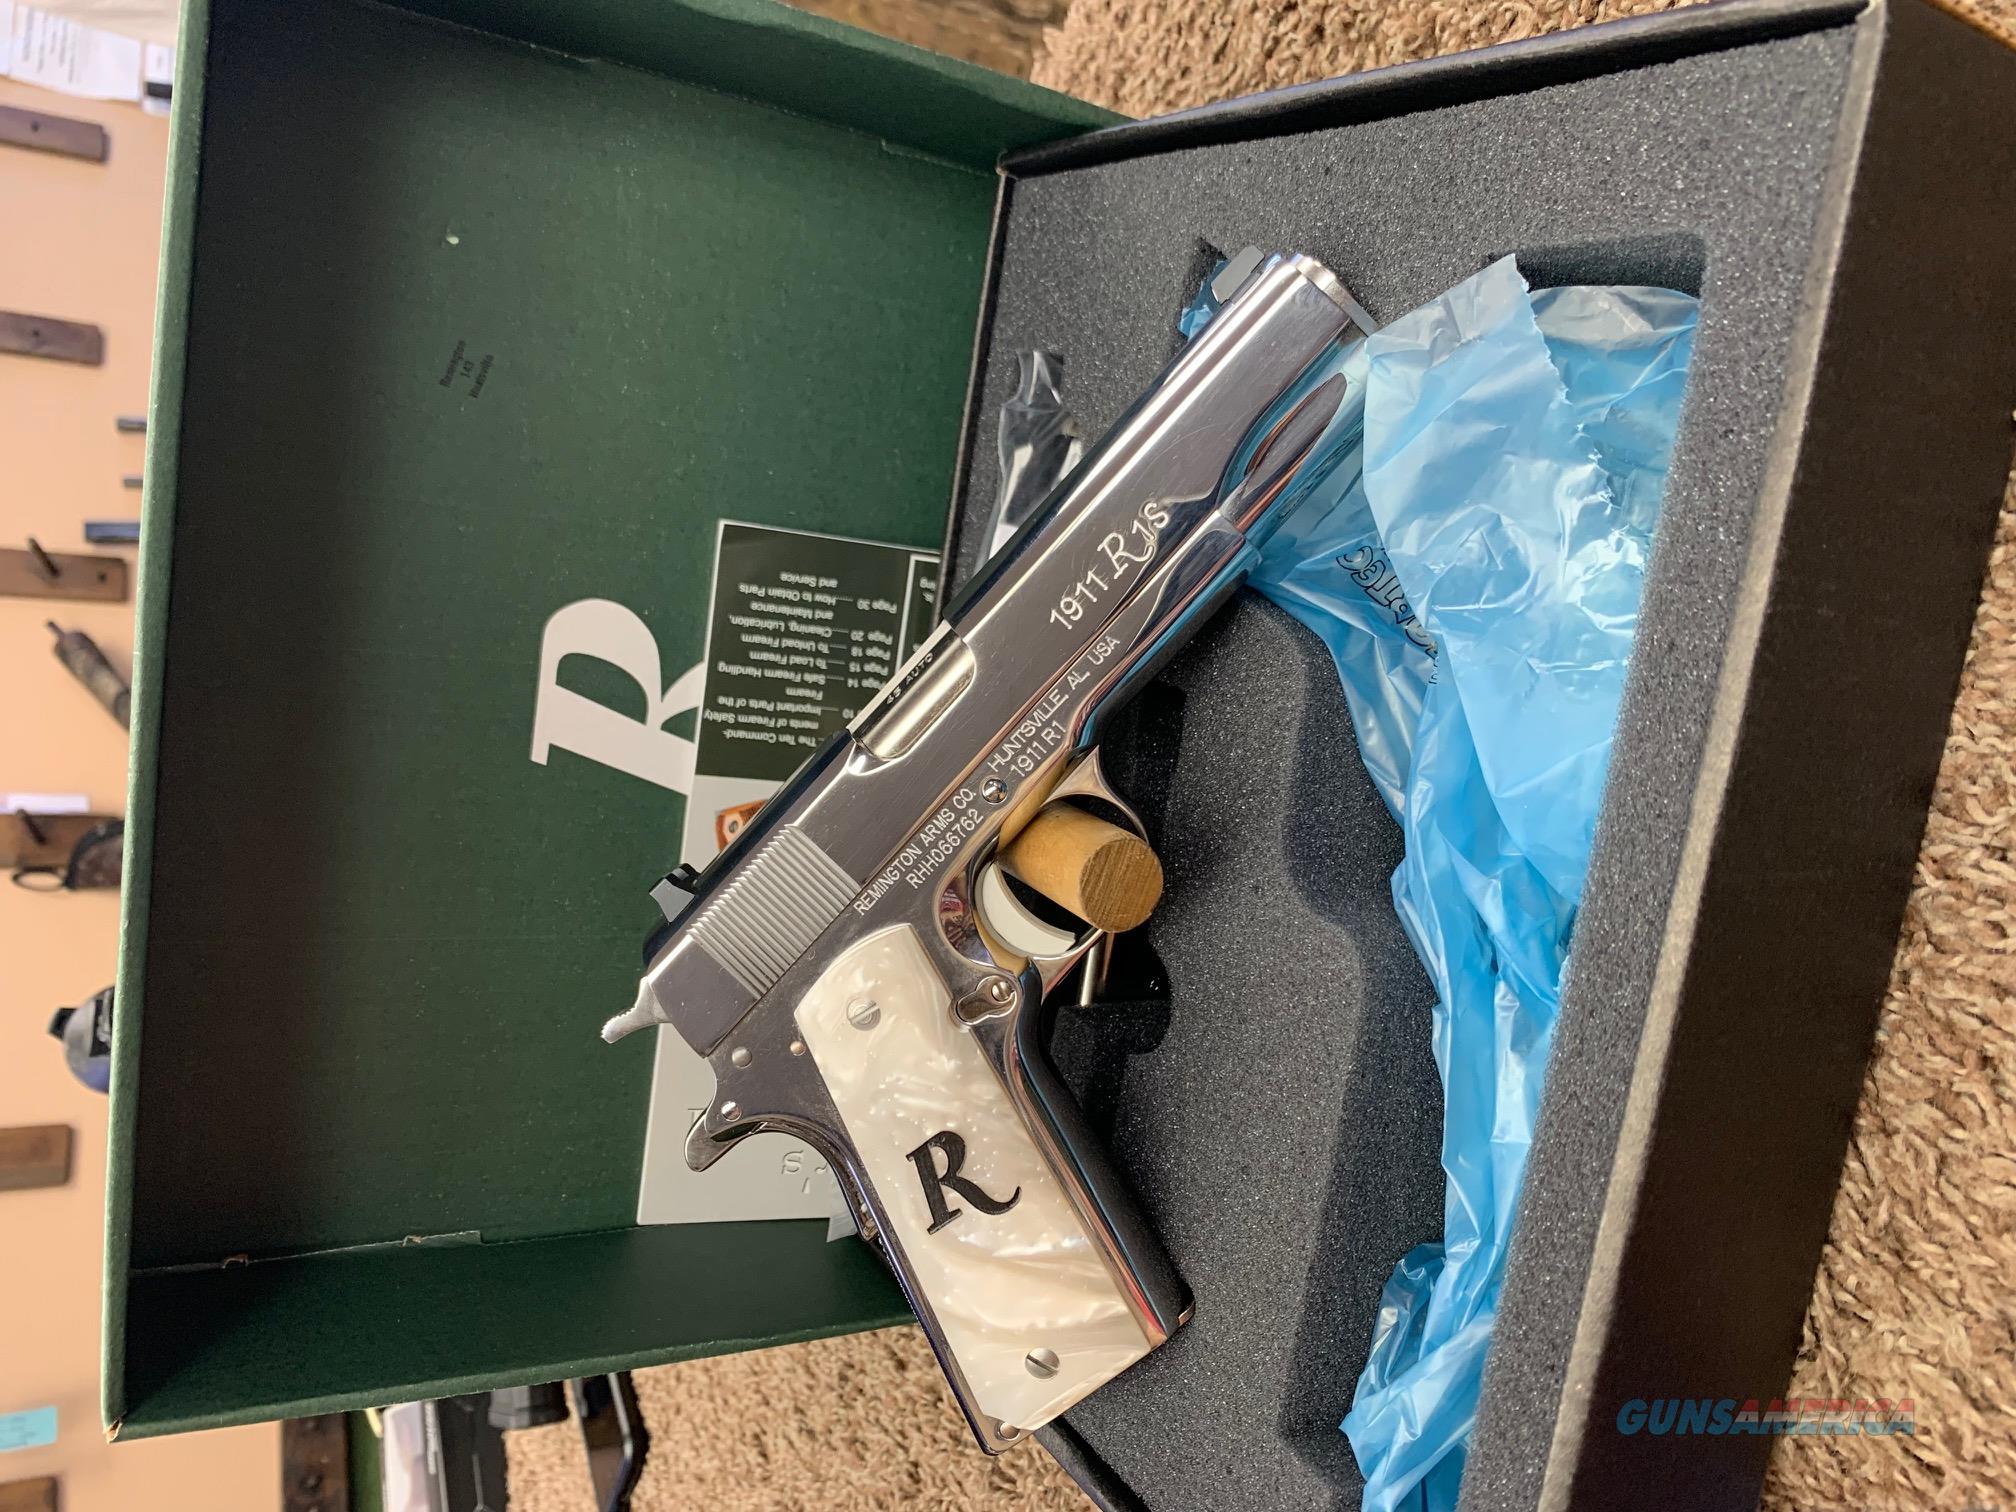 96304 Remington 1911 R1 Polished Stainless/White Pearl Exclusive - 45 ACP  Guns > Pistols > Remington Pistols - Modern